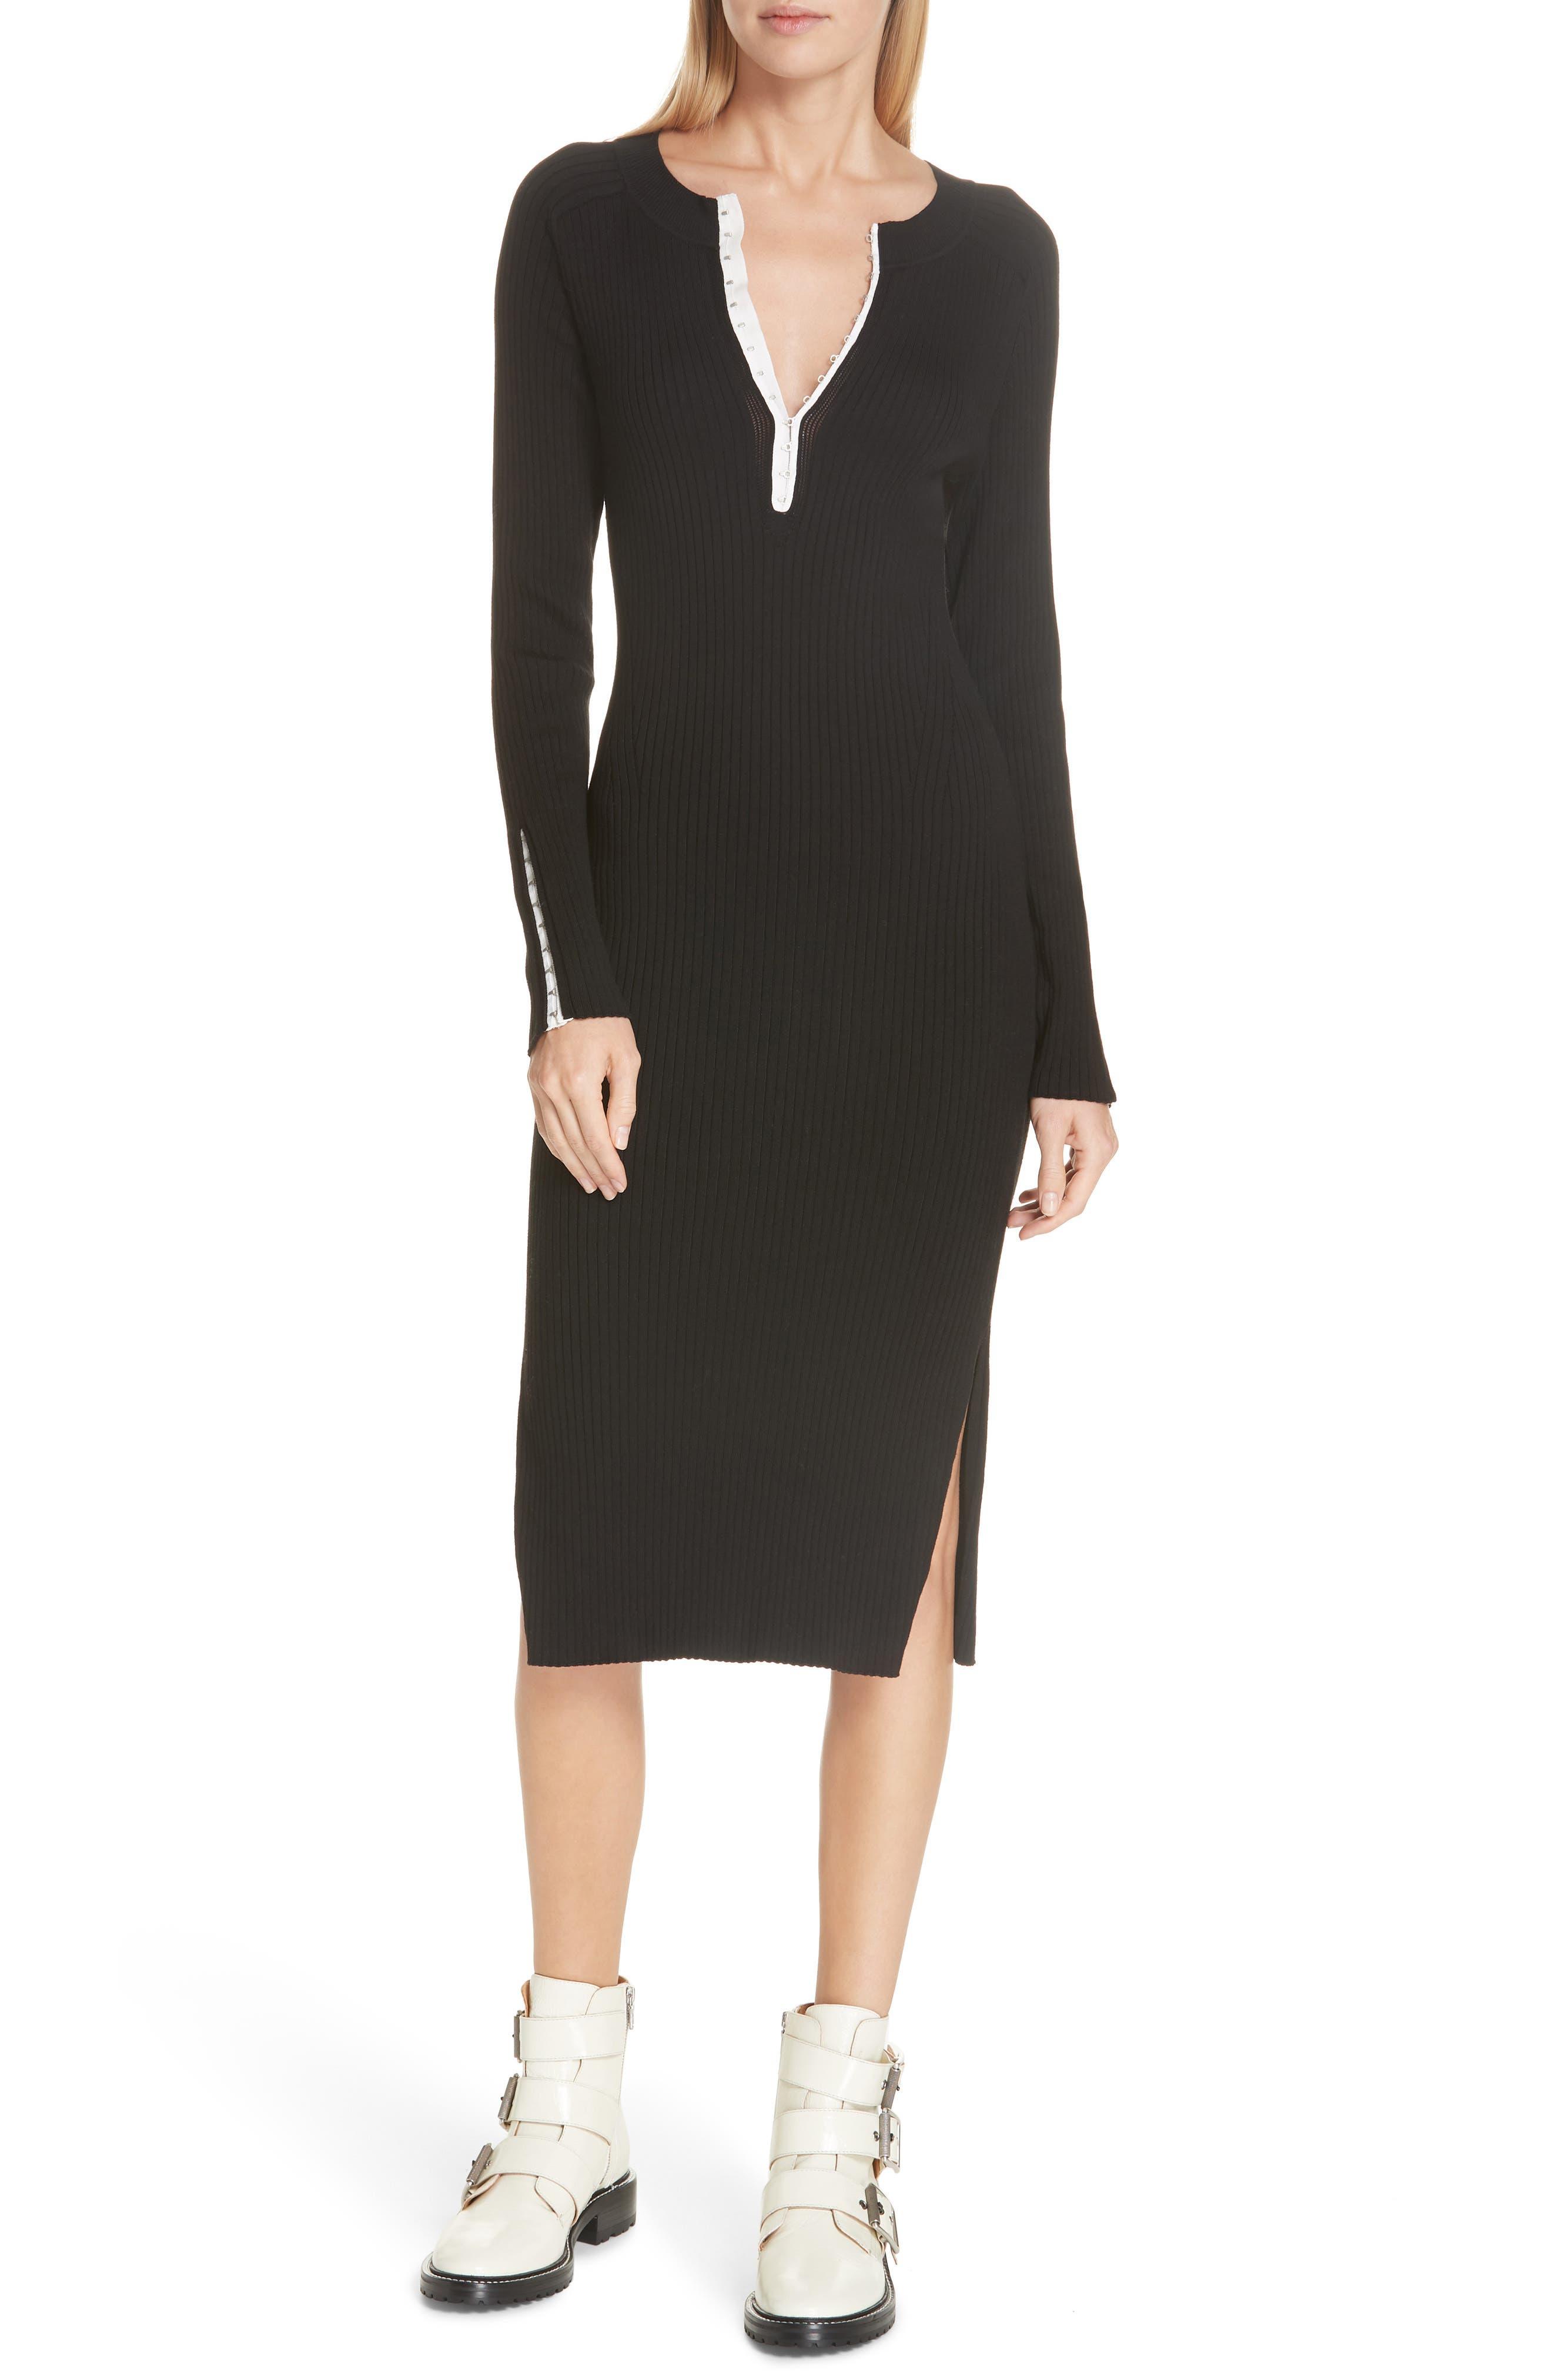 RAG & BONE Brynn Rib Knit Dress, Main, color, BLACK